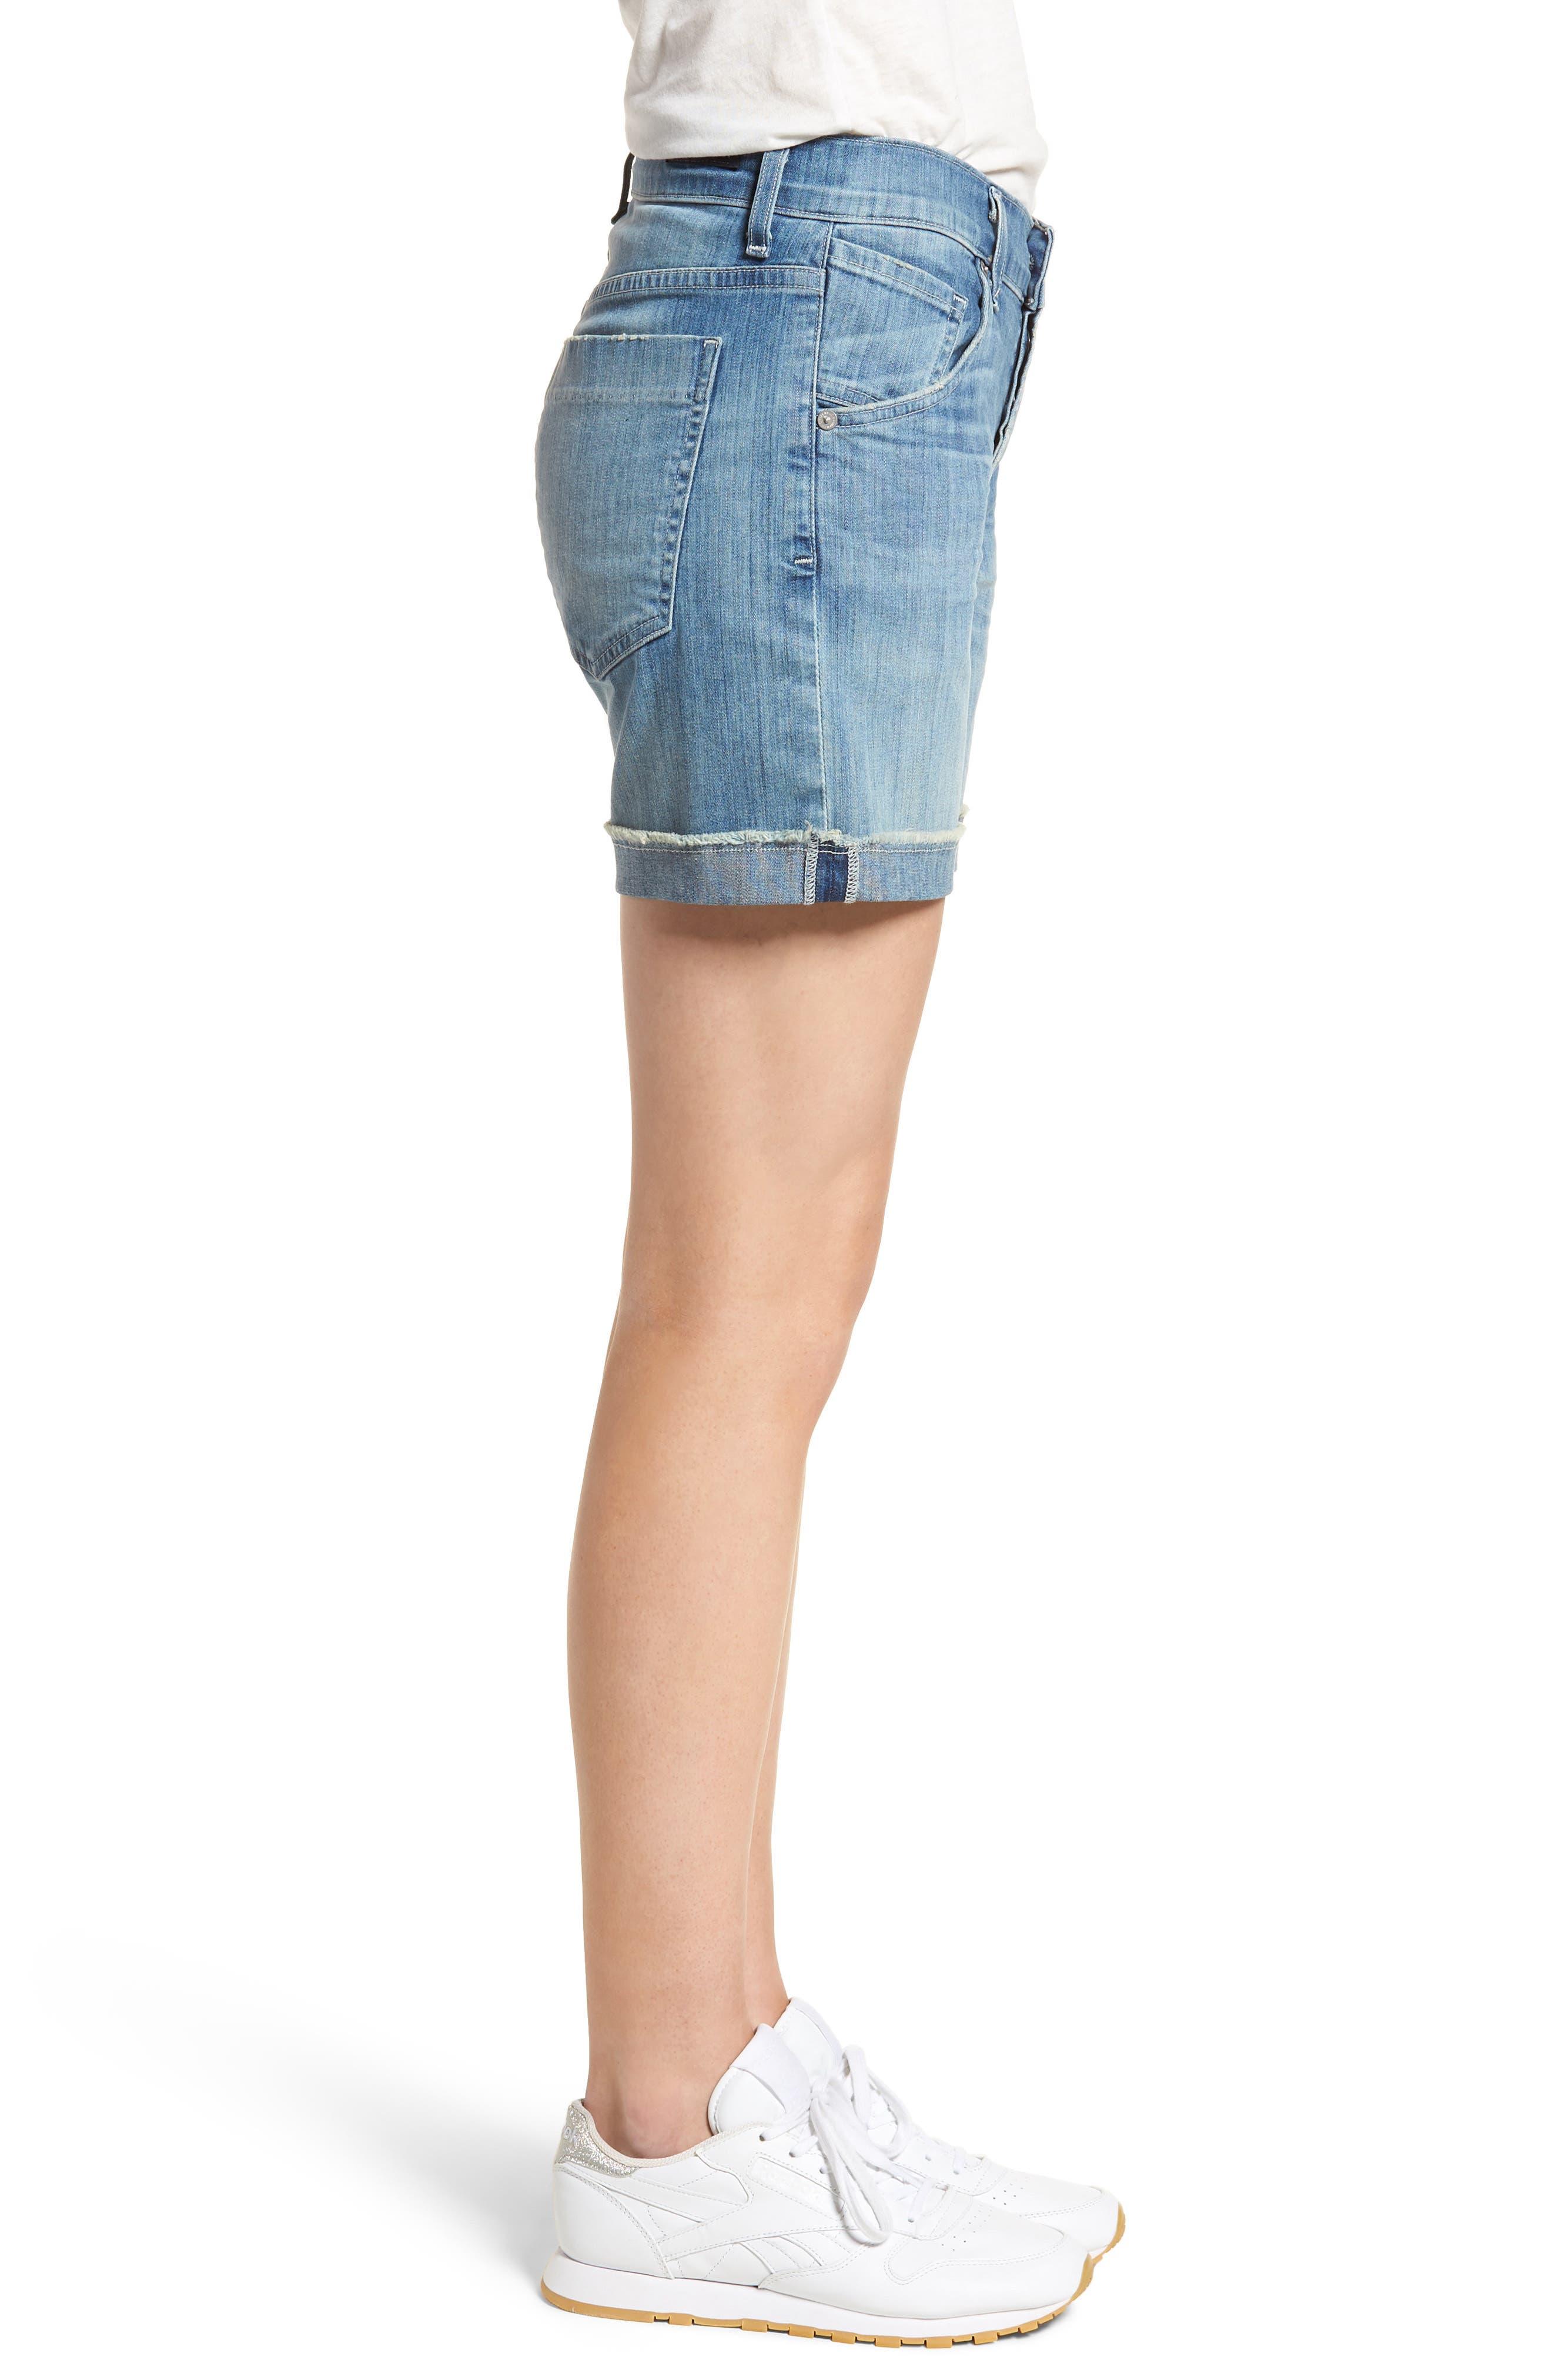 Skyler Denim Shorts,                             Alternate thumbnail 3, color,                             Mercury